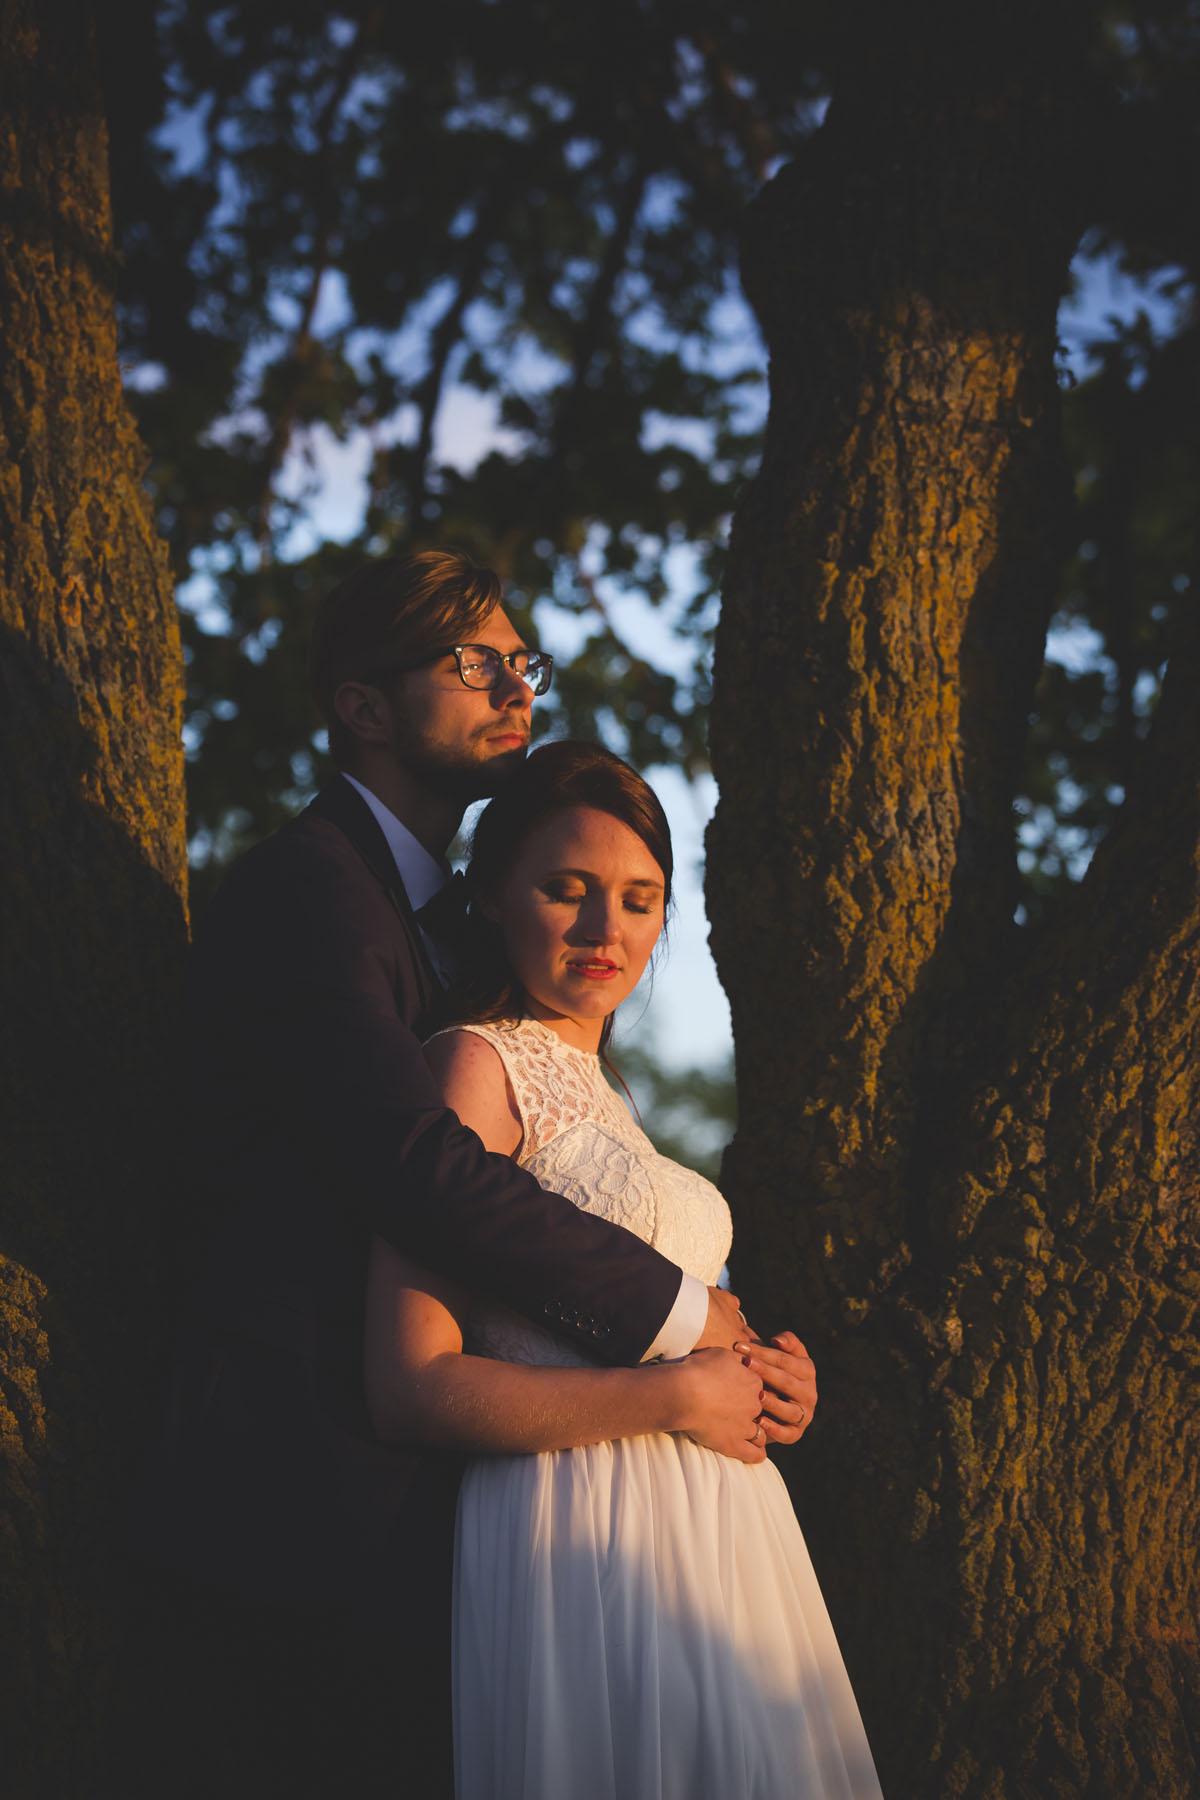 wedding-photos-163-best-wedding-photographer.jpg